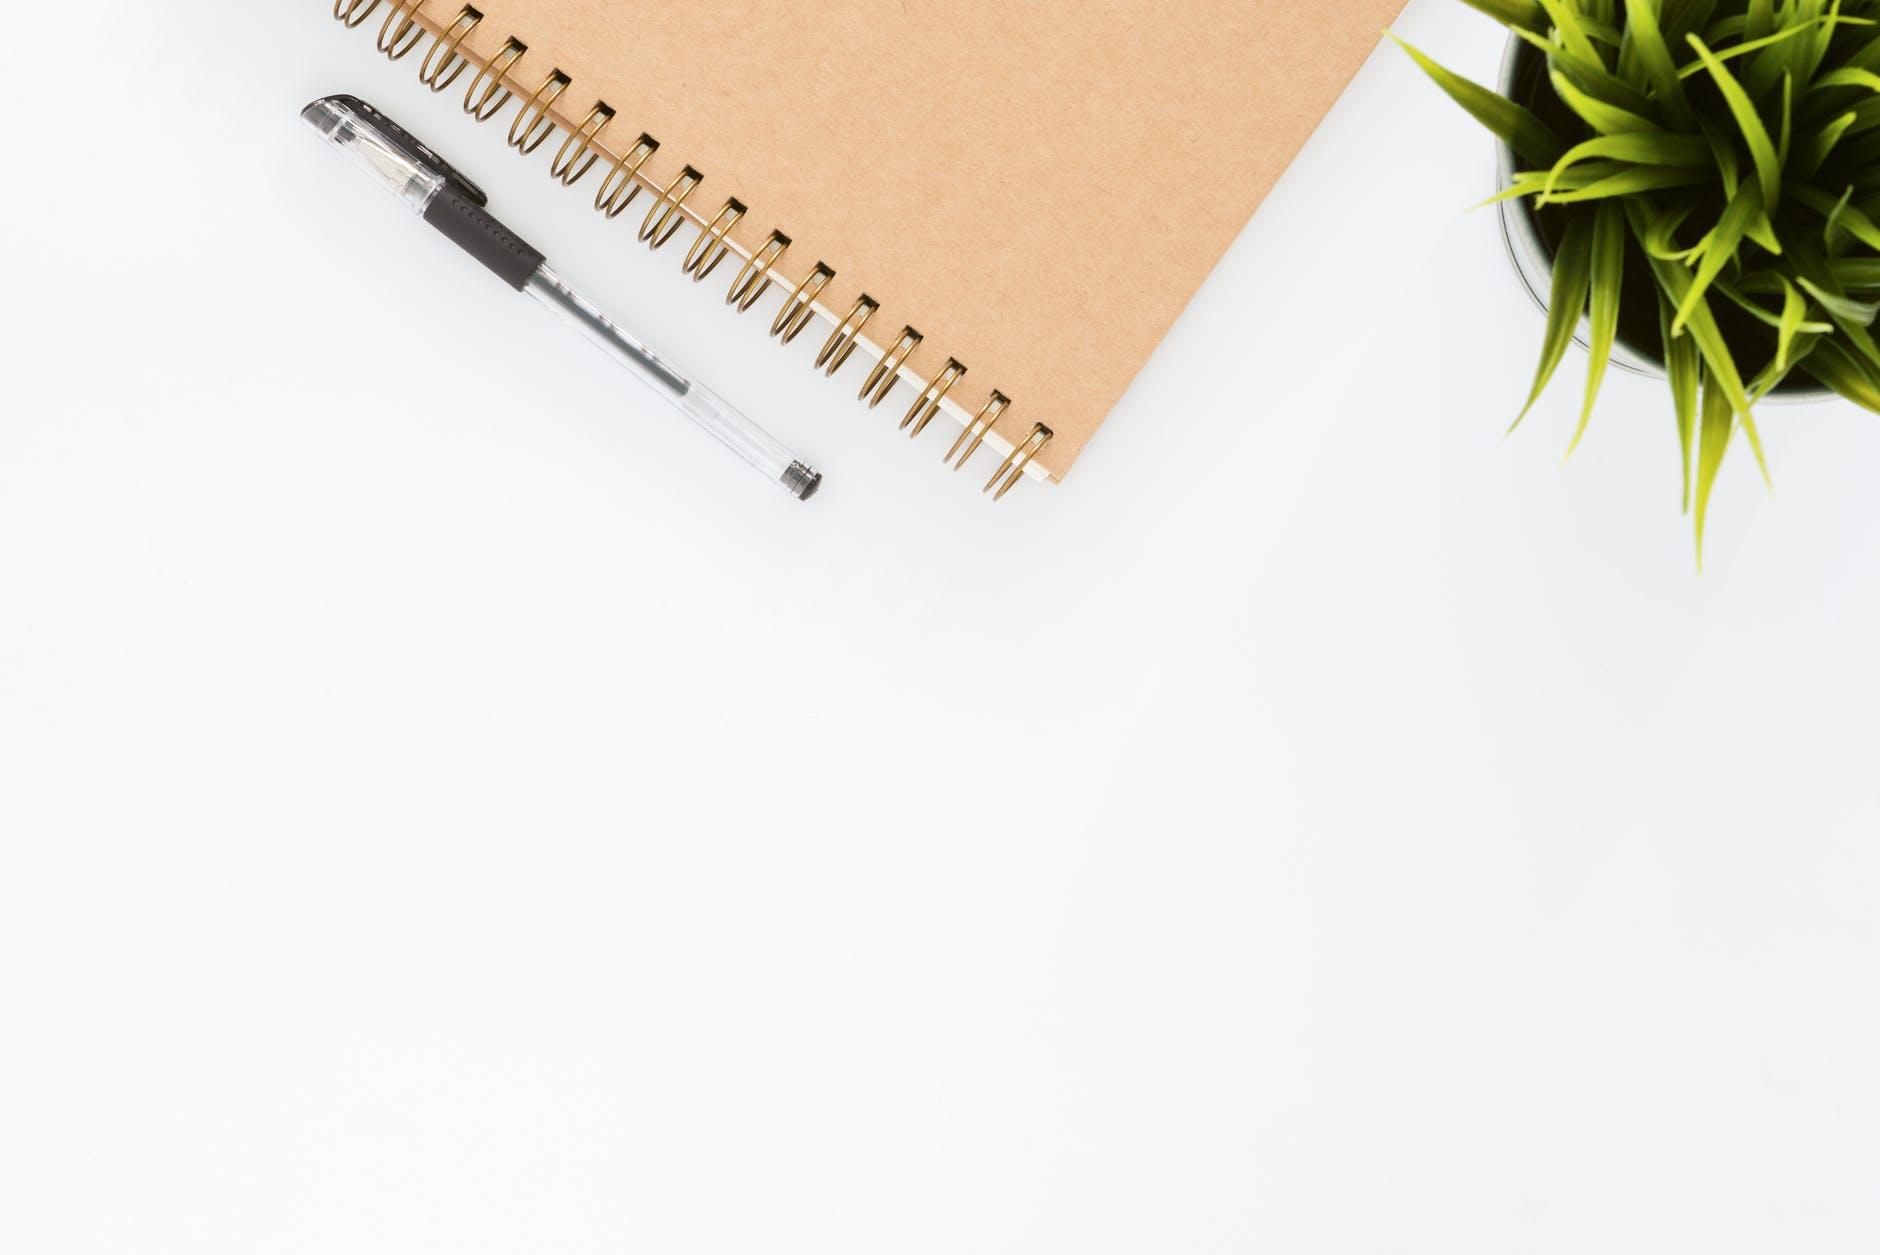 10 School Tips During COVID-19//Preparing